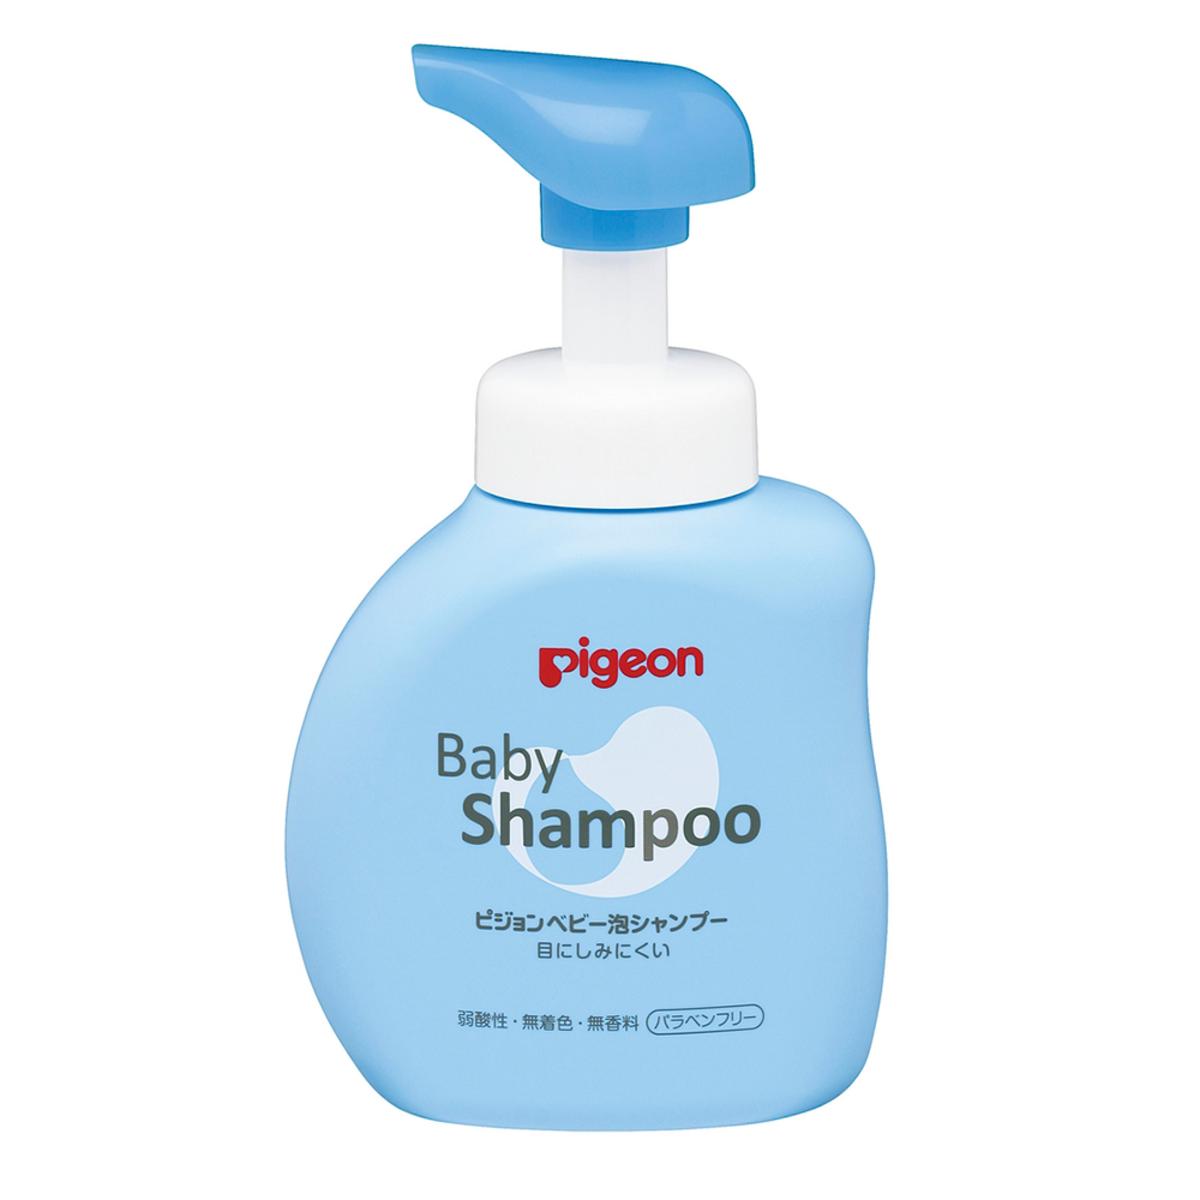 Pigeon Kids Hair Body Wash Strawberry Grape 350ml Refill Daftar Liquid Pr070105